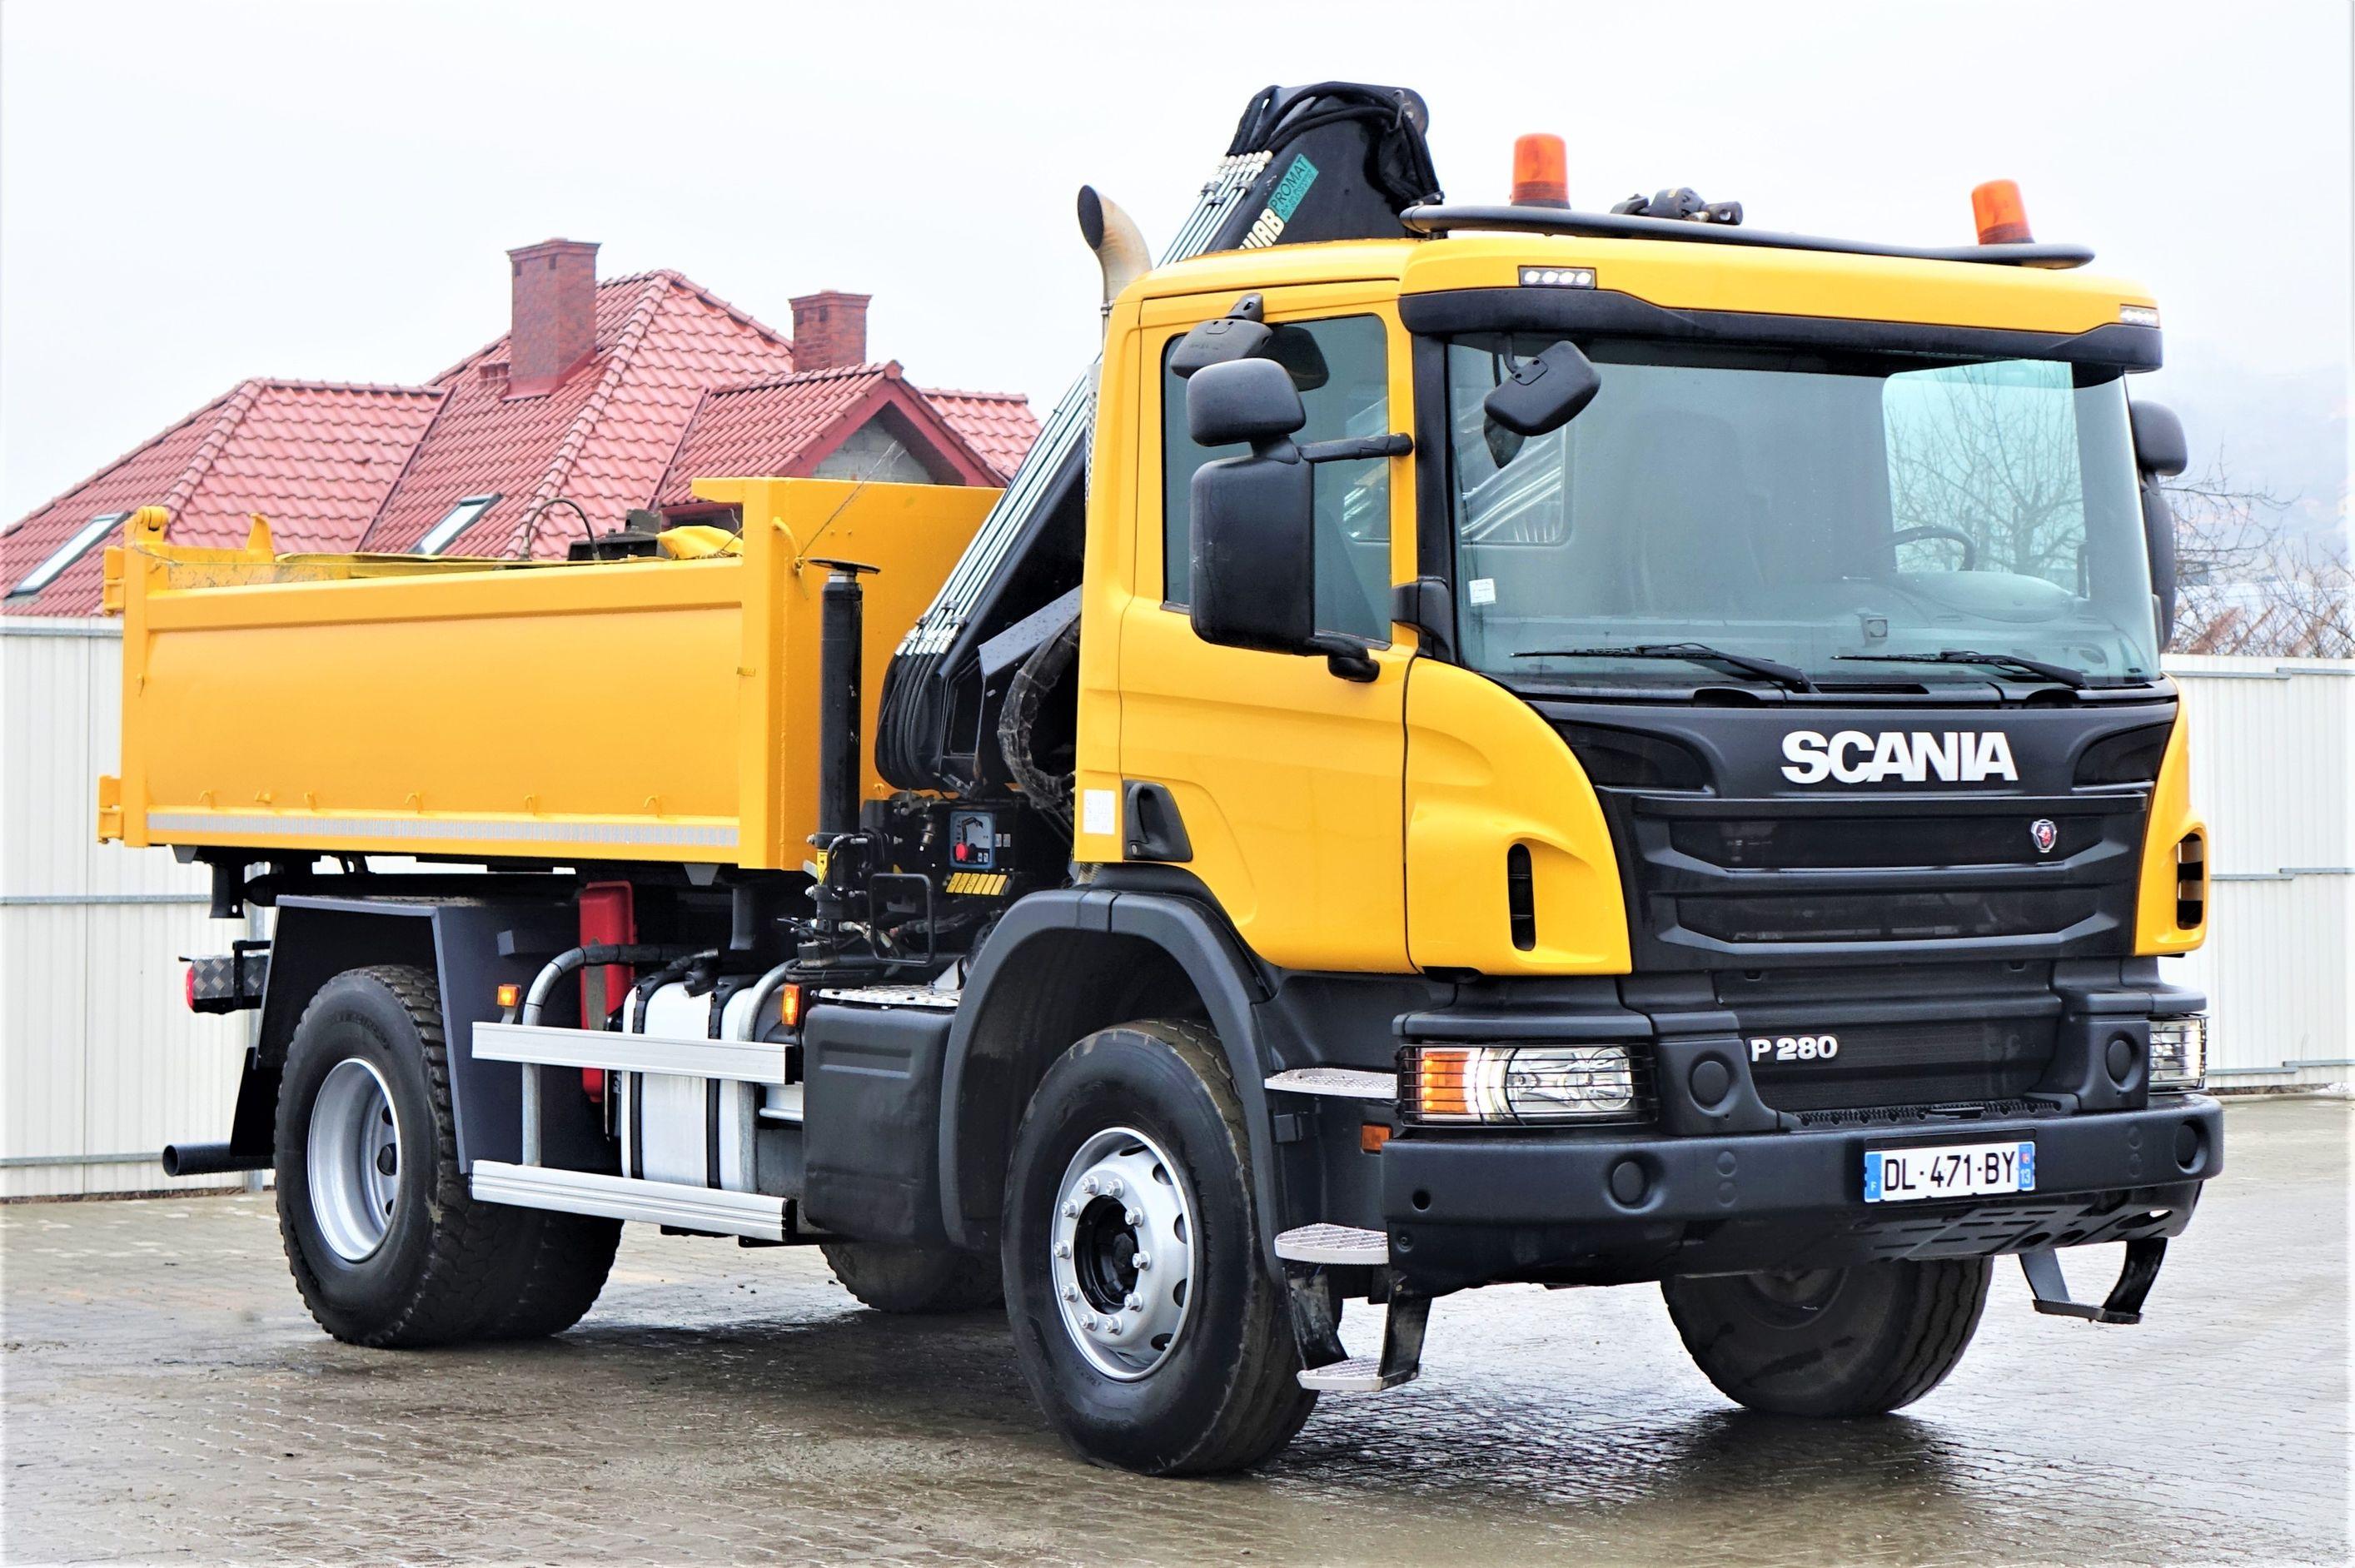 2015-scania-p280-17711308